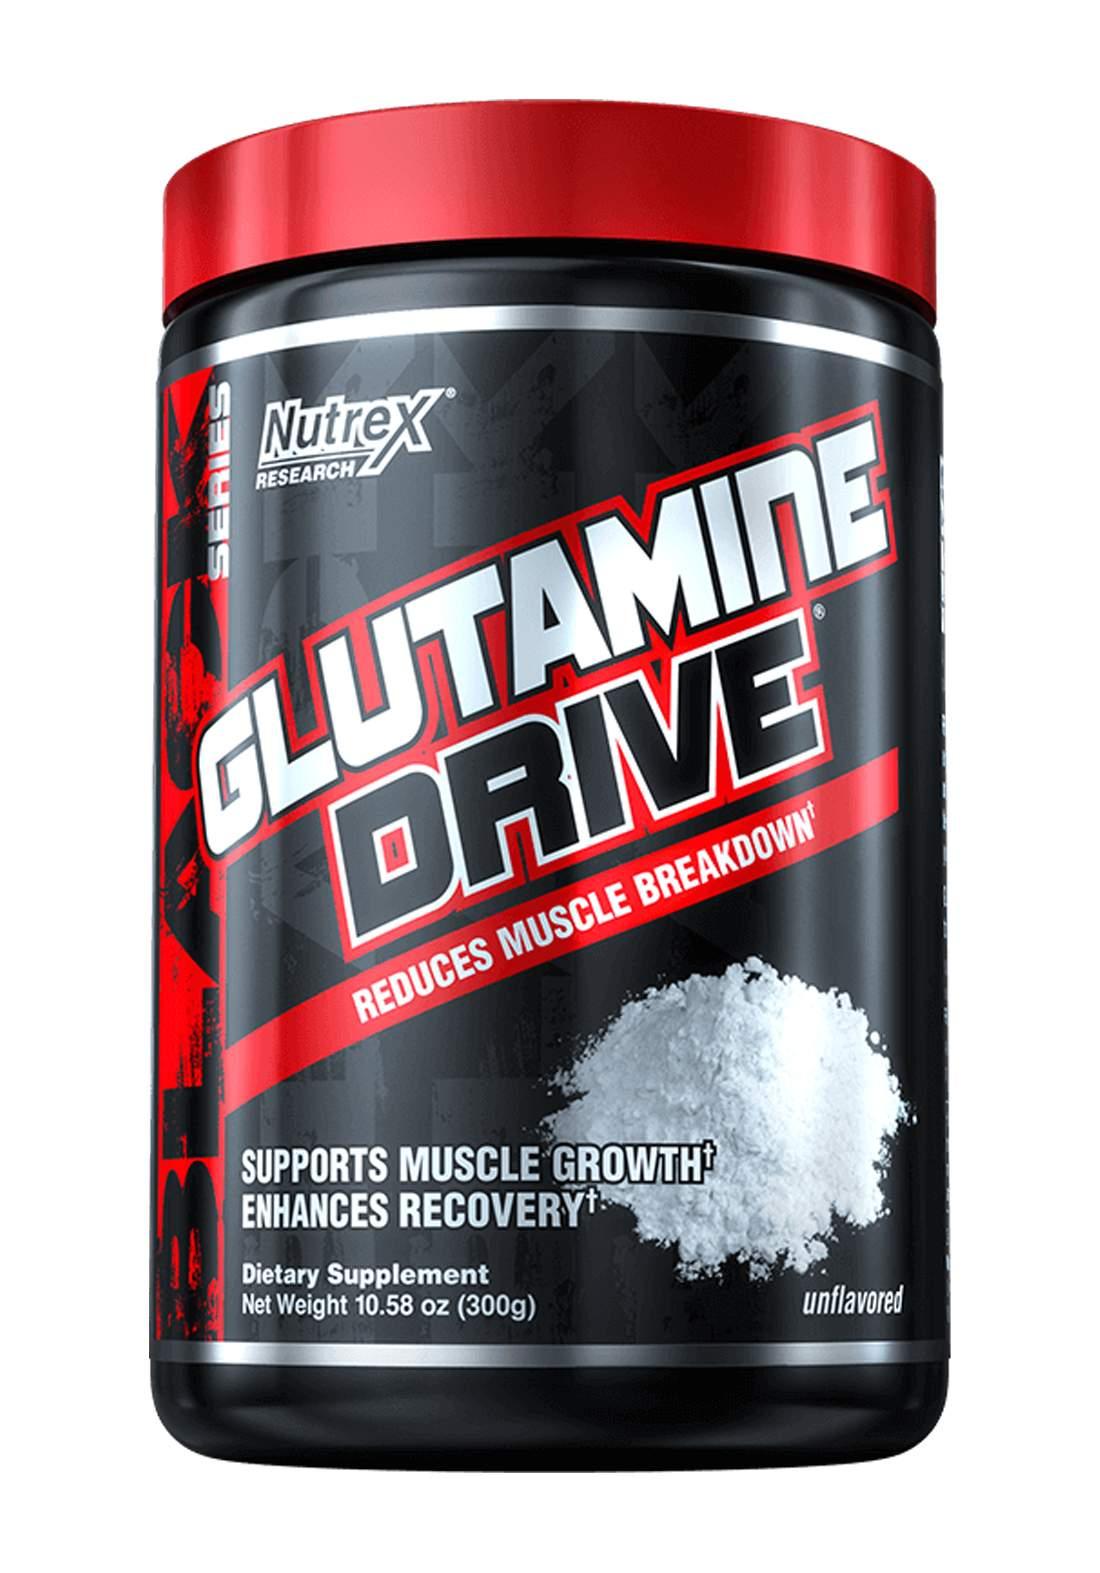 Nutrex Glutamine Drive  Muscle Breakdown 1000g مكمل غذائي لانقاص الوزن